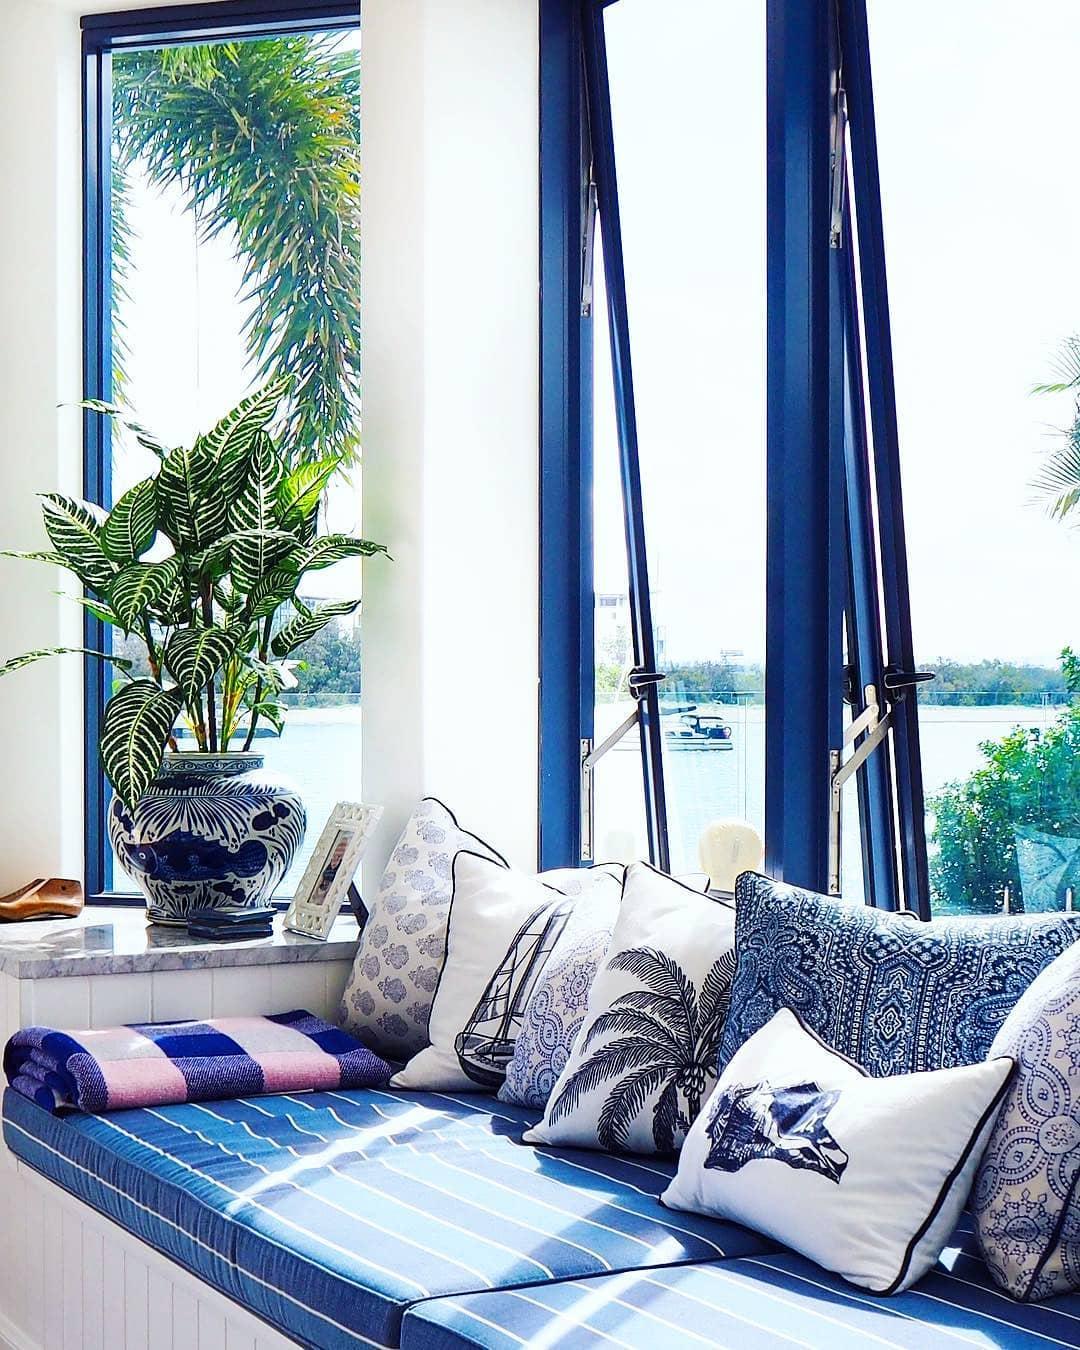 Pakai Sofa Ini Untuk Ruang Tamu Minimalis Agar Tidak